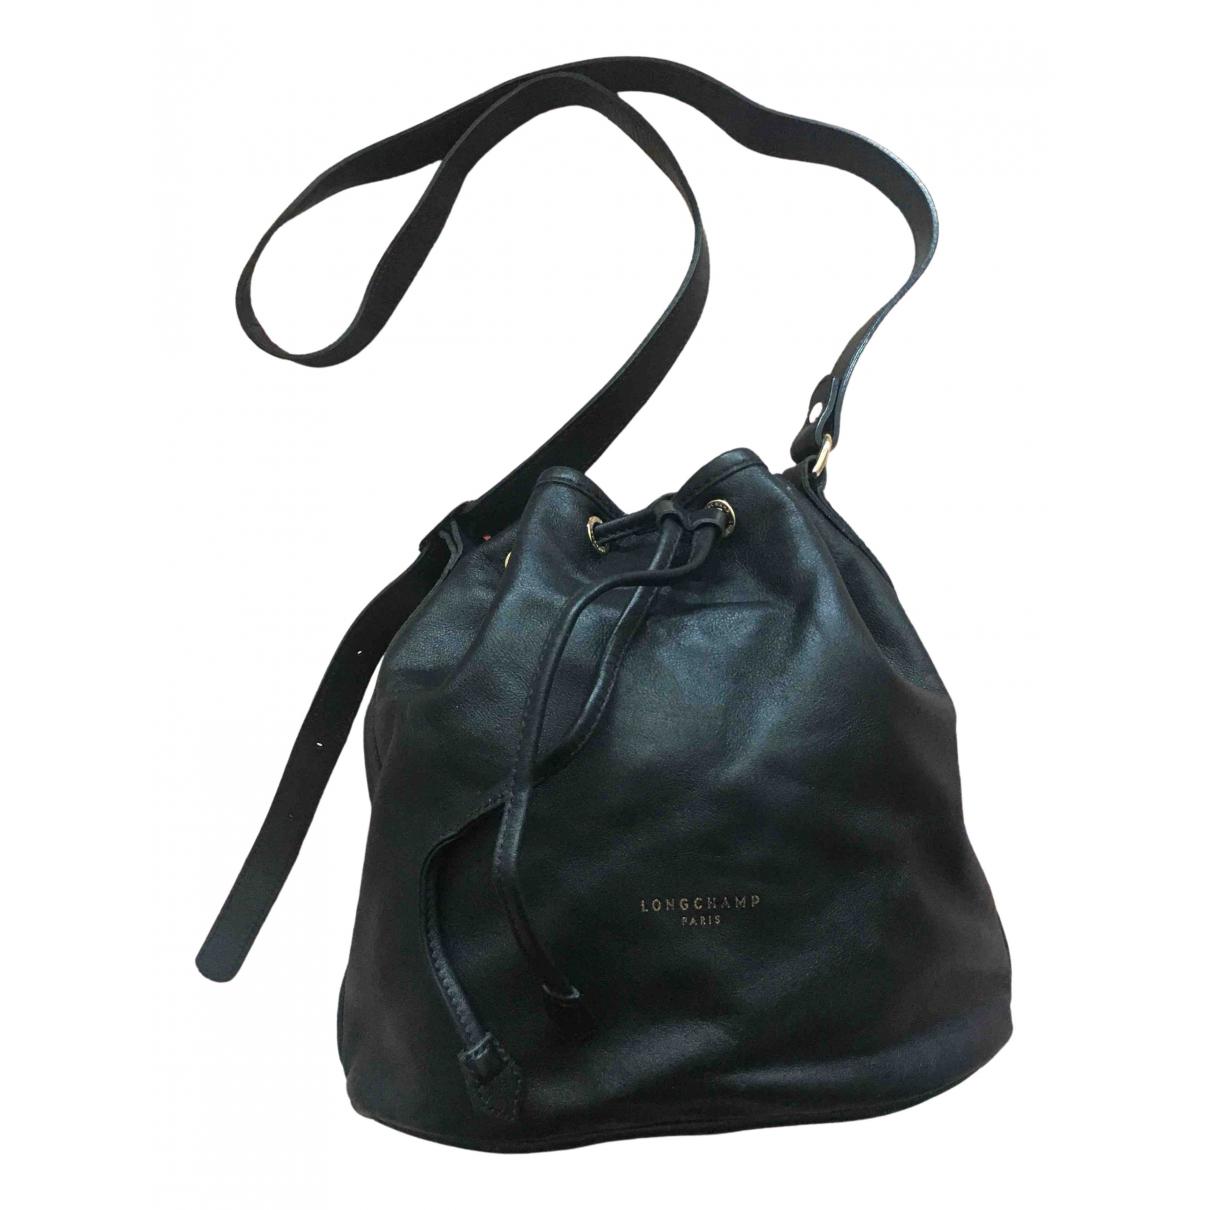 Longchamp \N Black Leather Clutch bag for Women \N